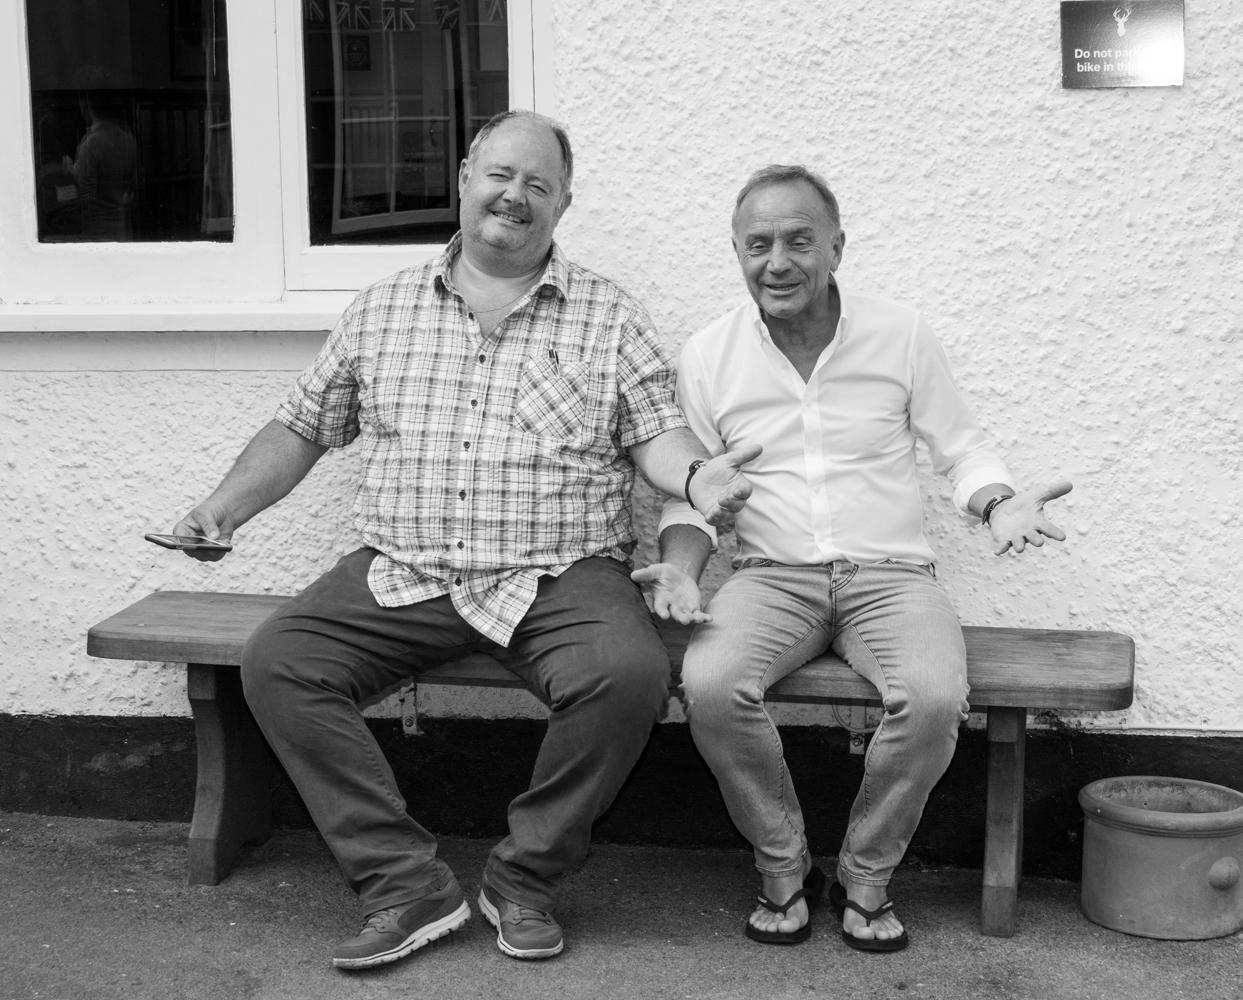 Lorenzo and Roberto